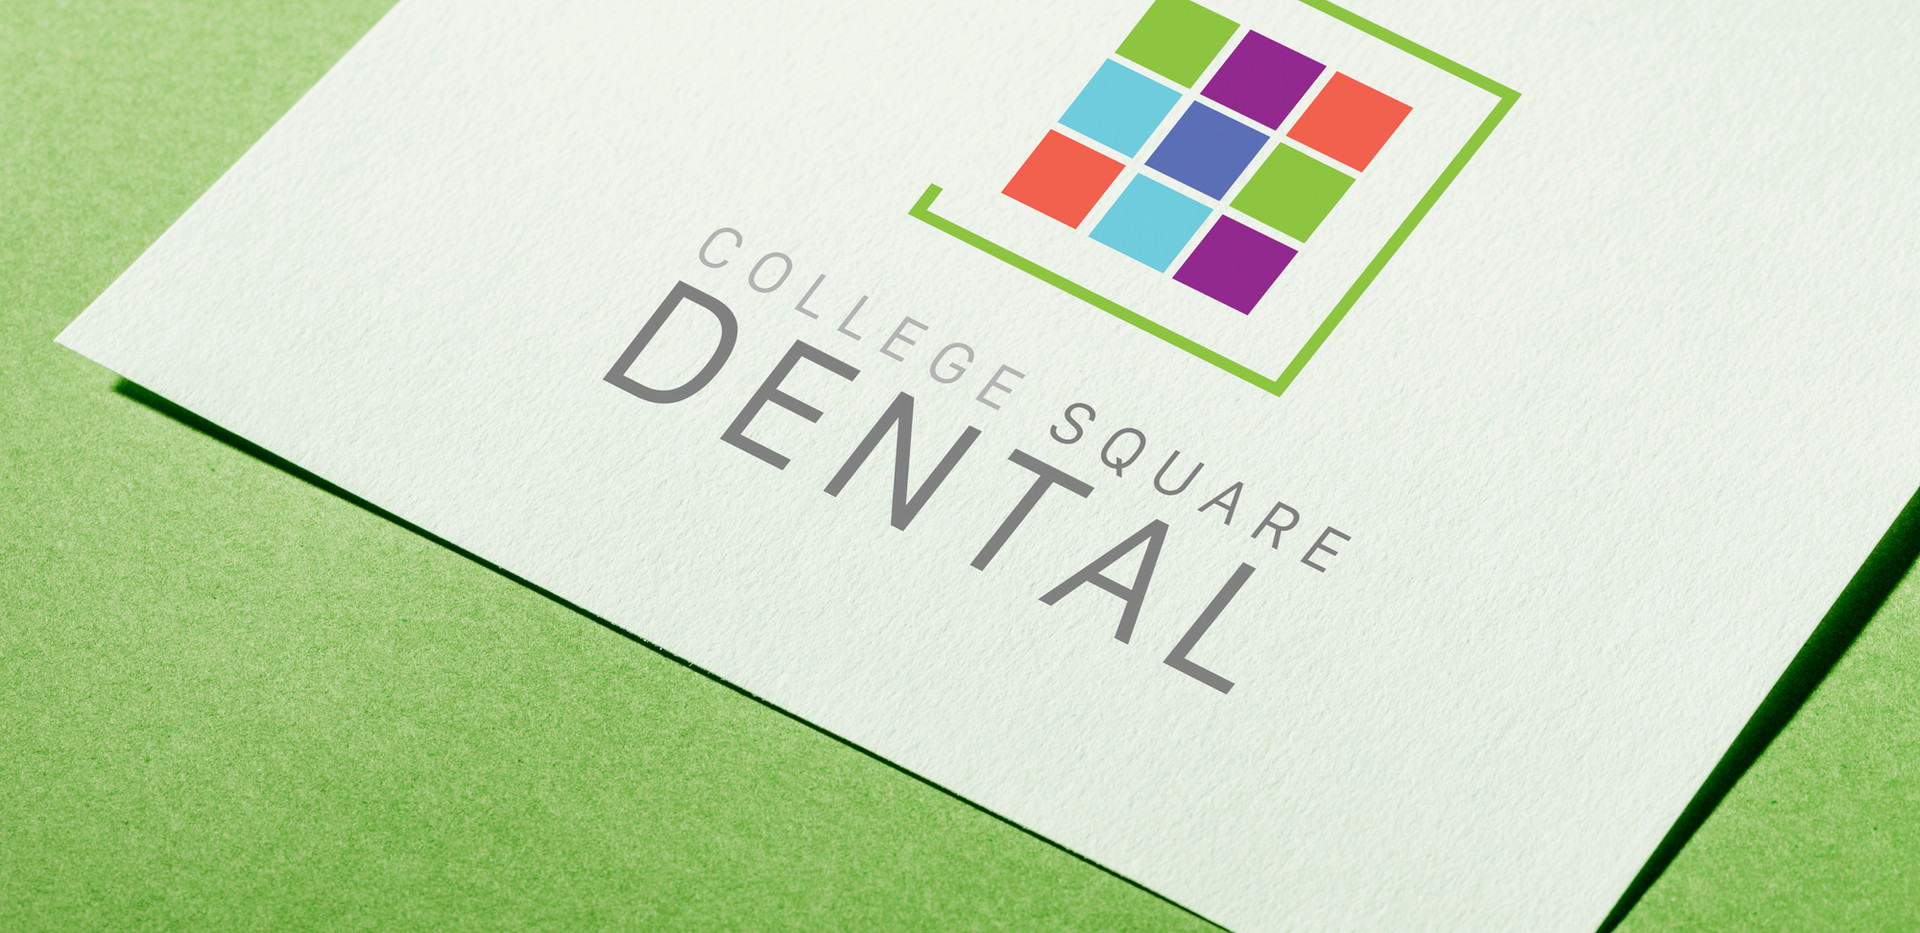 College Square Dental Logo